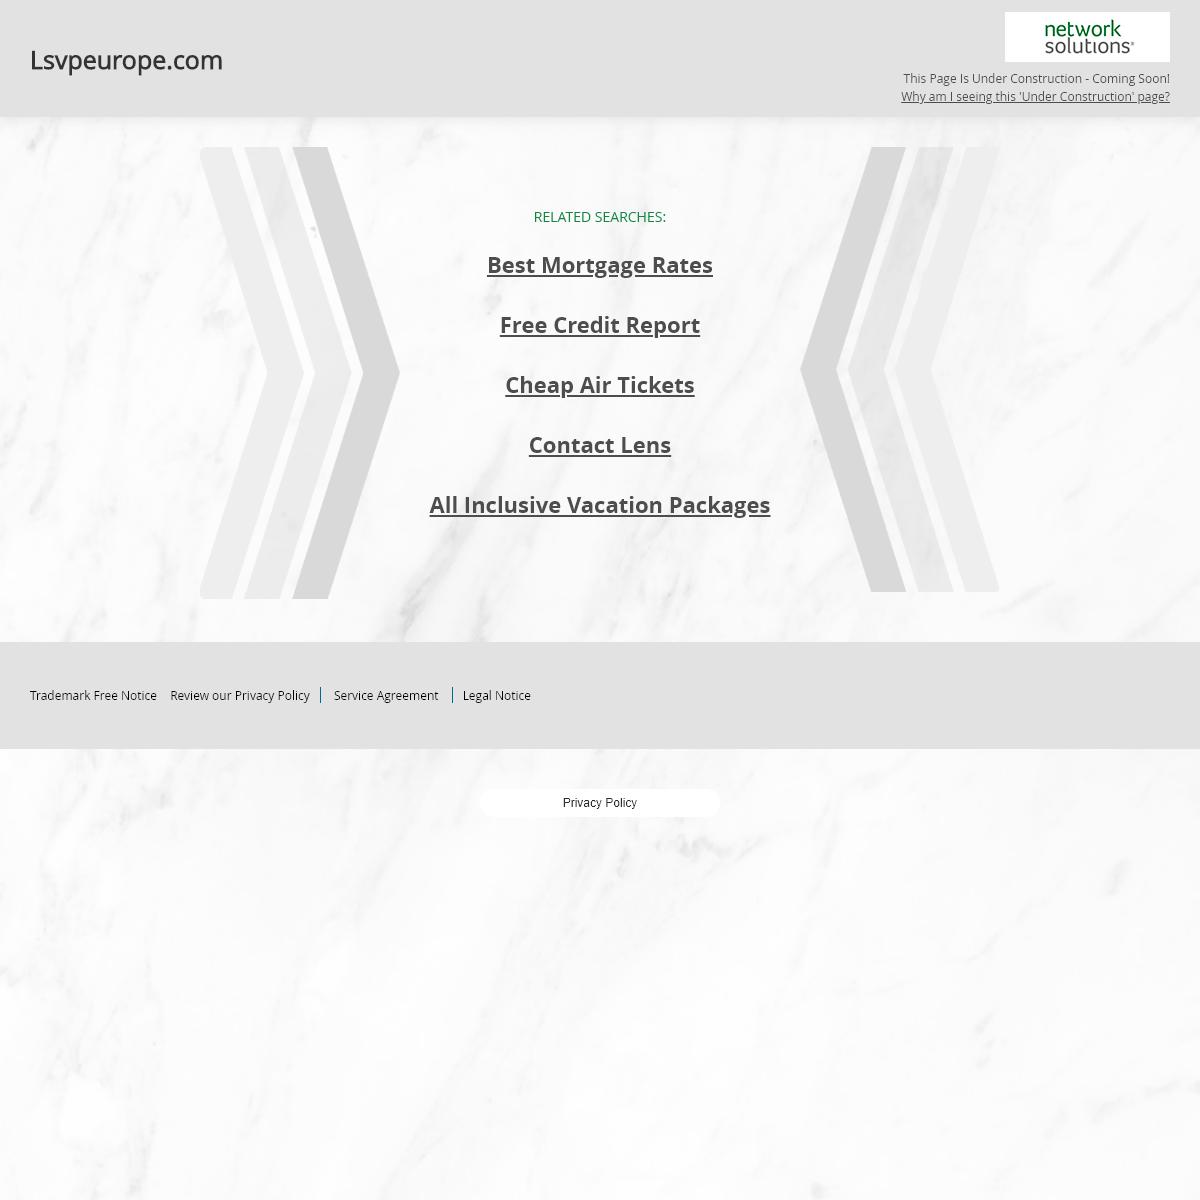 Lsvpeurope.com